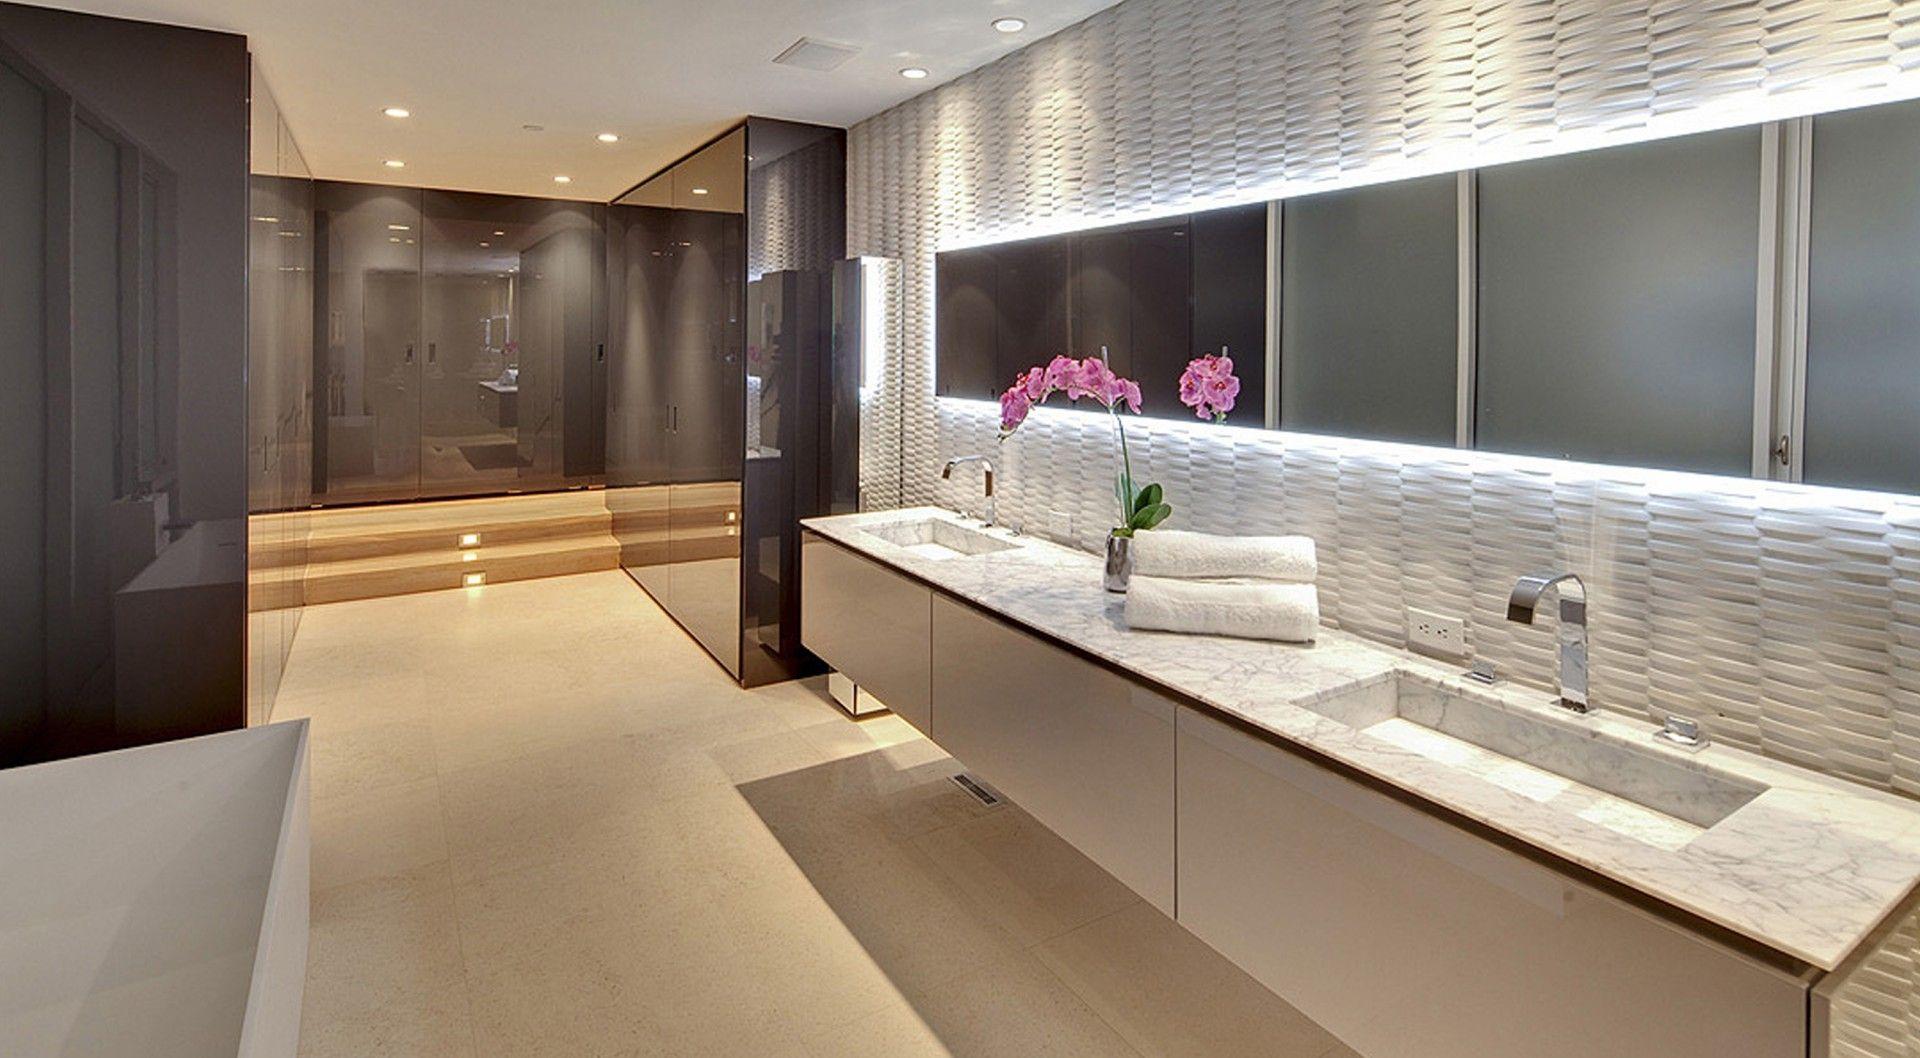 los angeles laguna beach architecture projects mcclean design - Bathroom Design Los Angeles